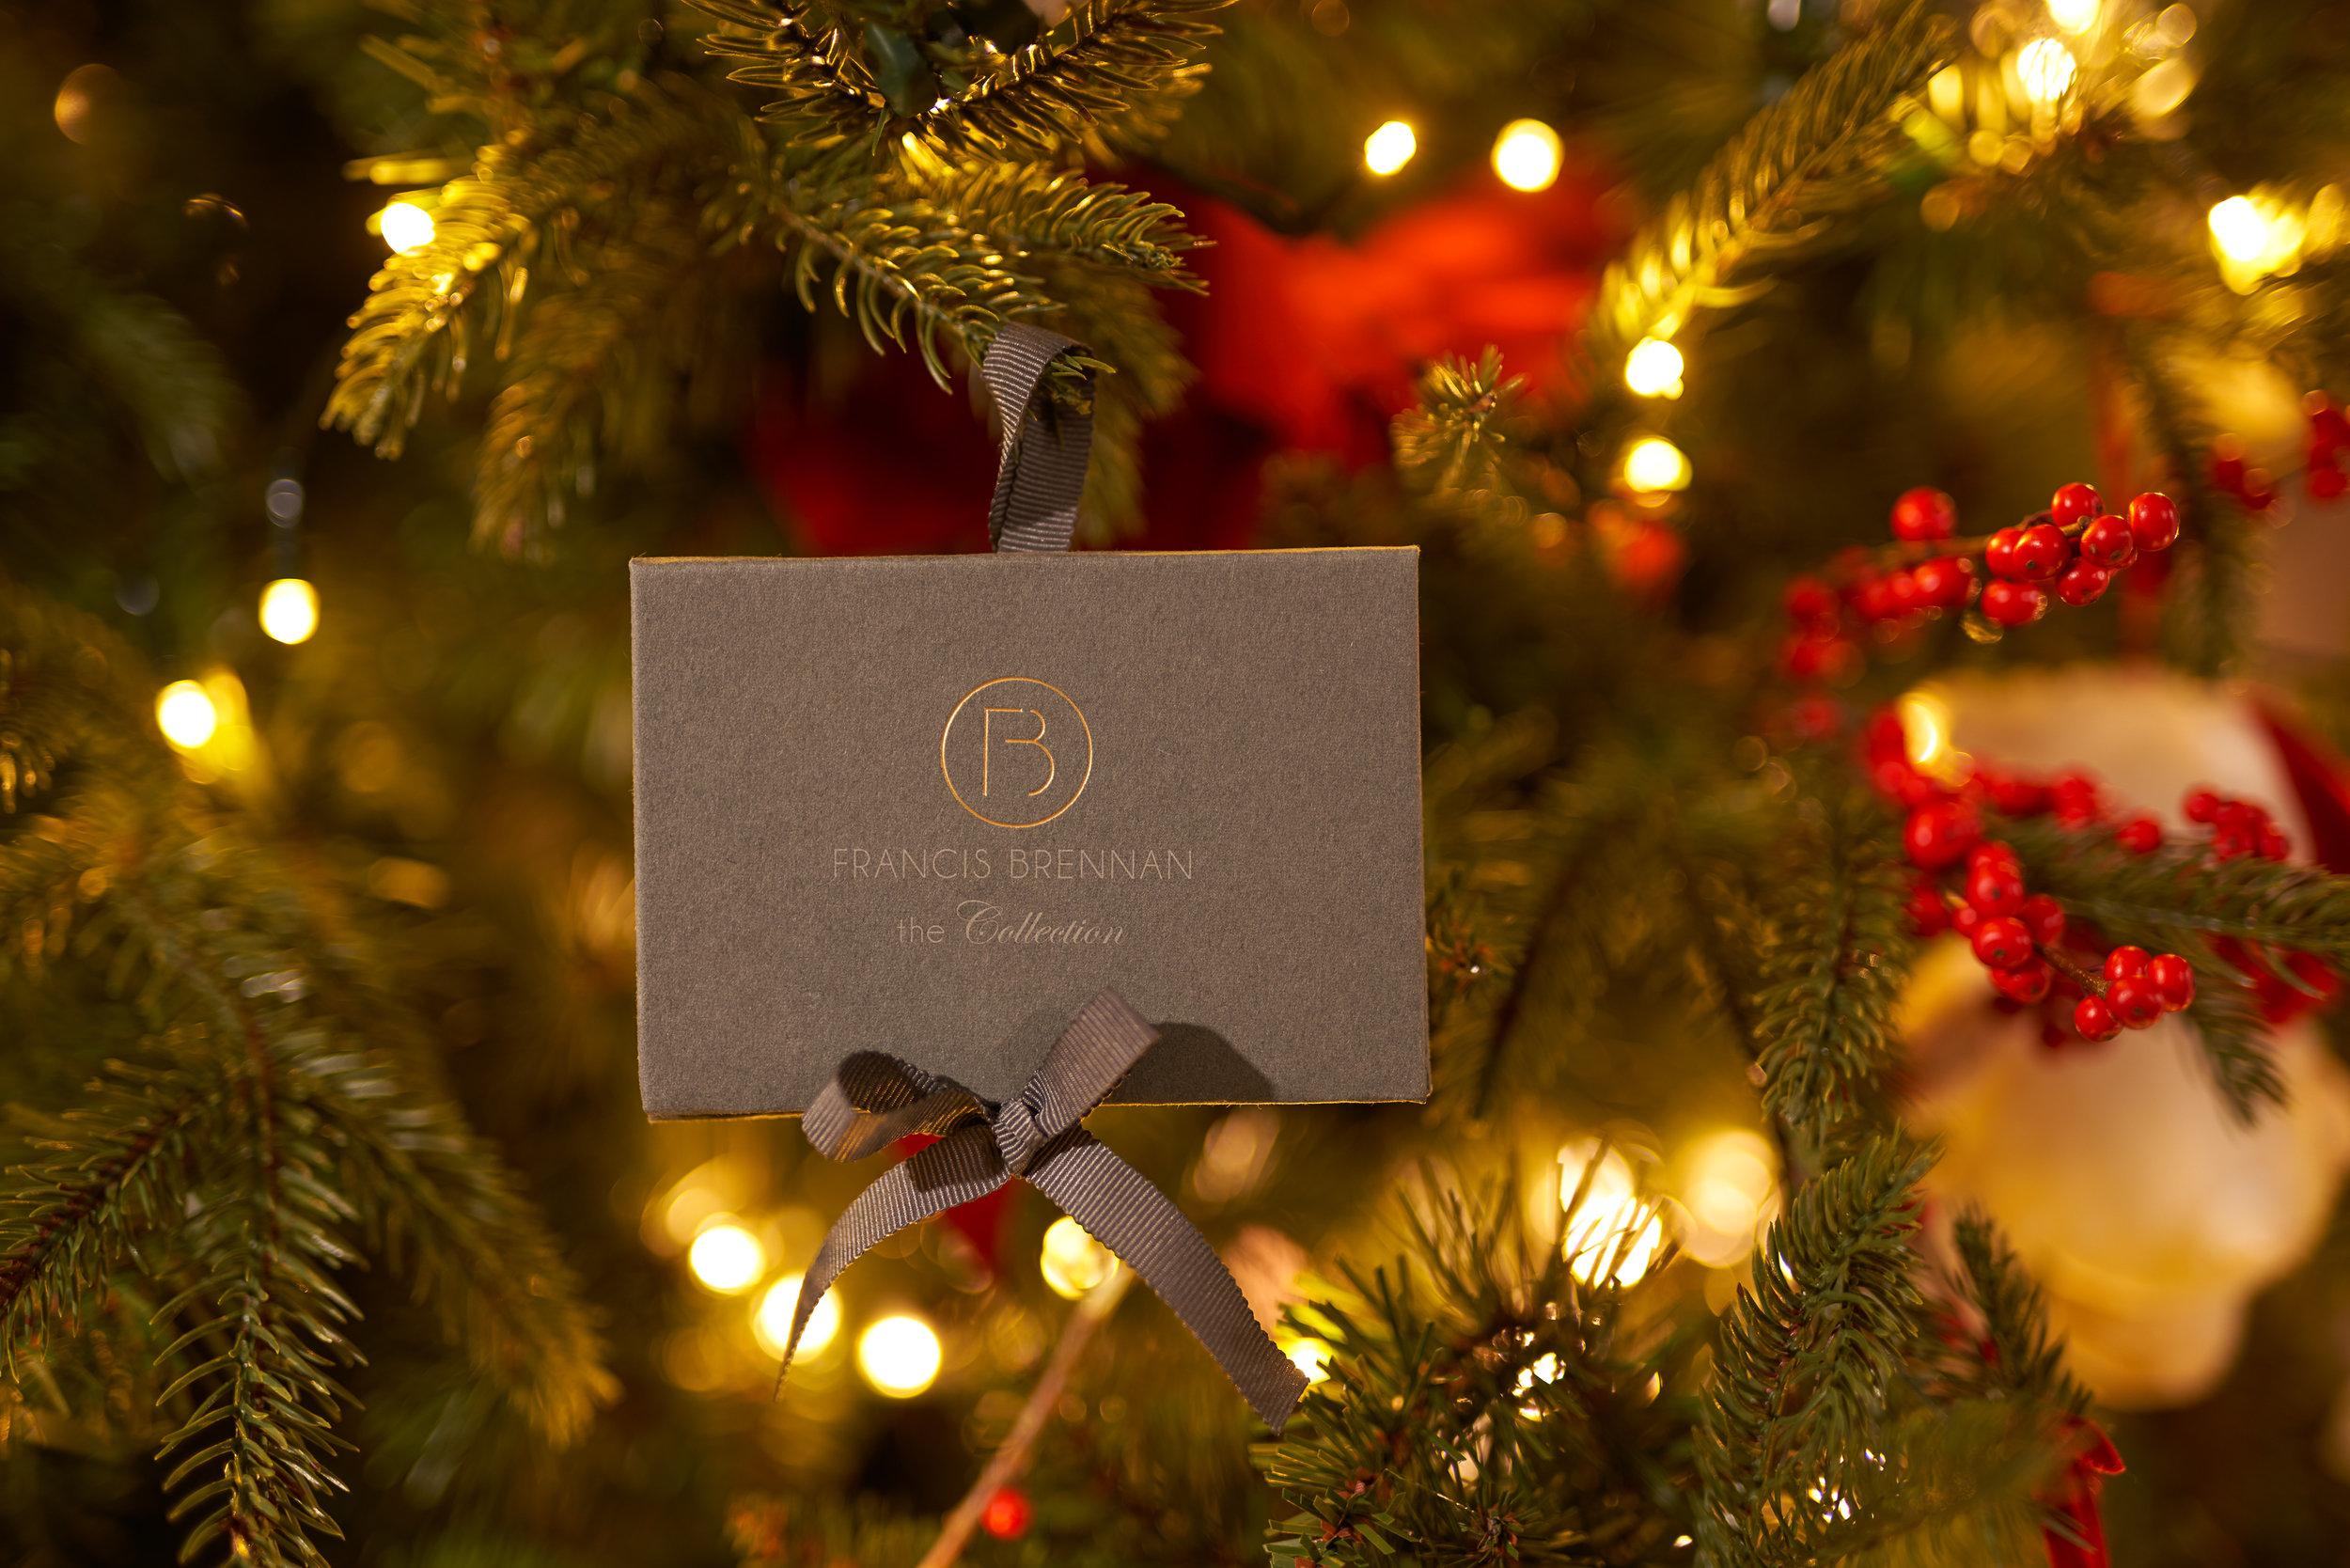 Gift Card Dec 4000px.jpg